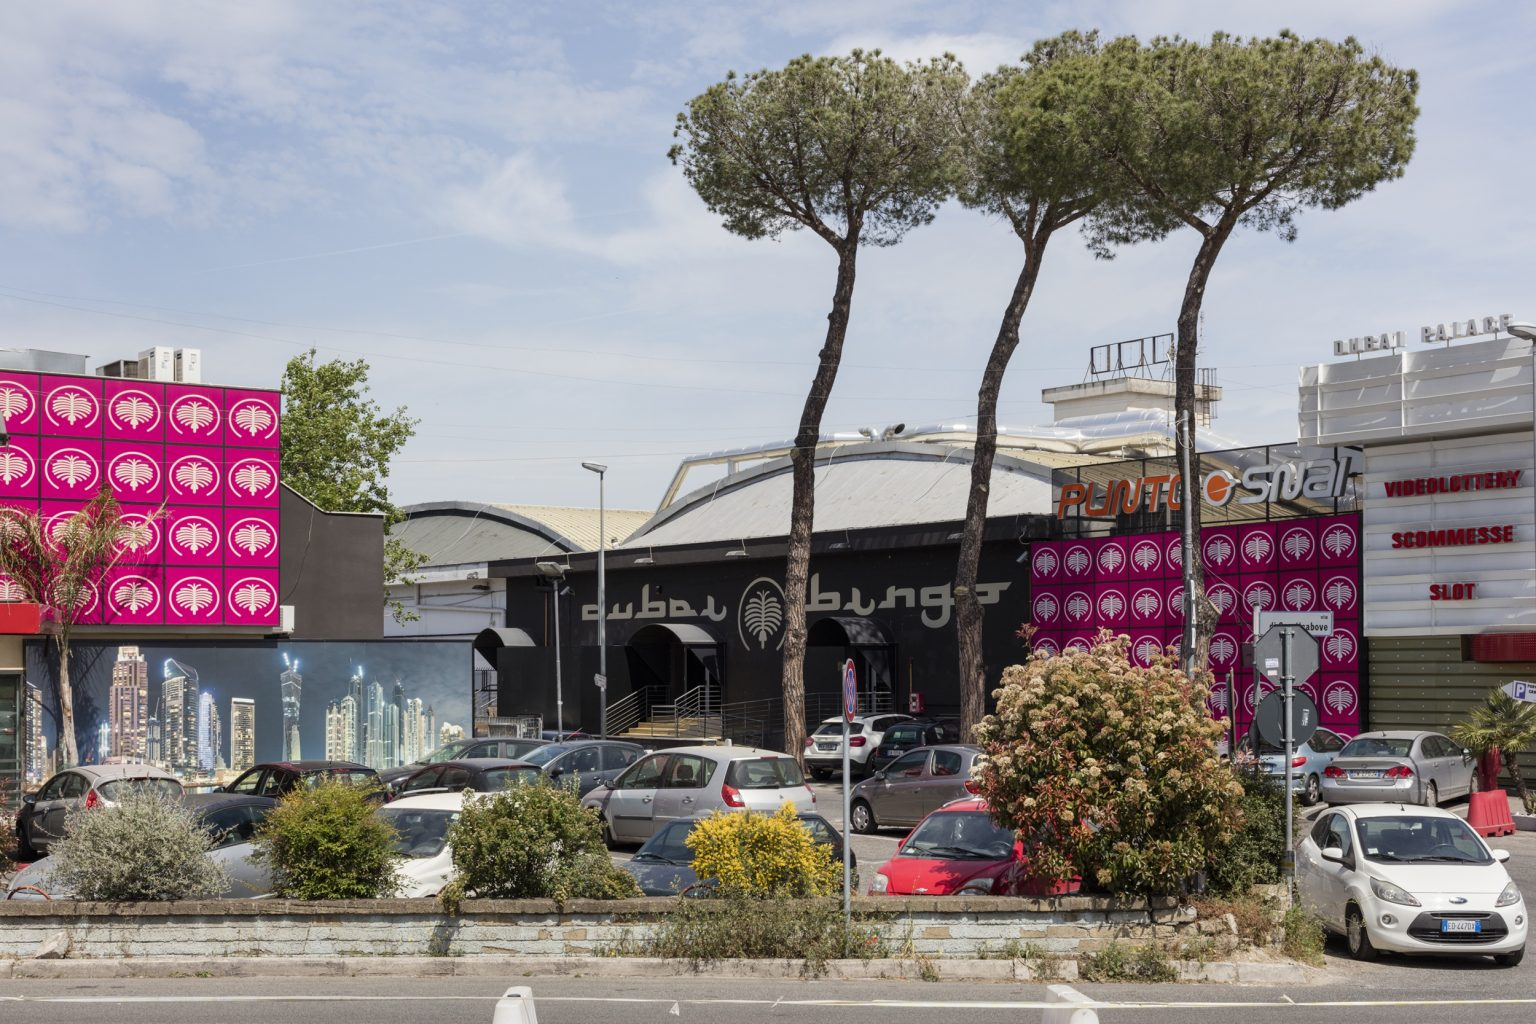 Rome, April 2016 - Via Tiburtina suburb. >< Roma, aprile 2016 - Periferia di Via Tiburtina.